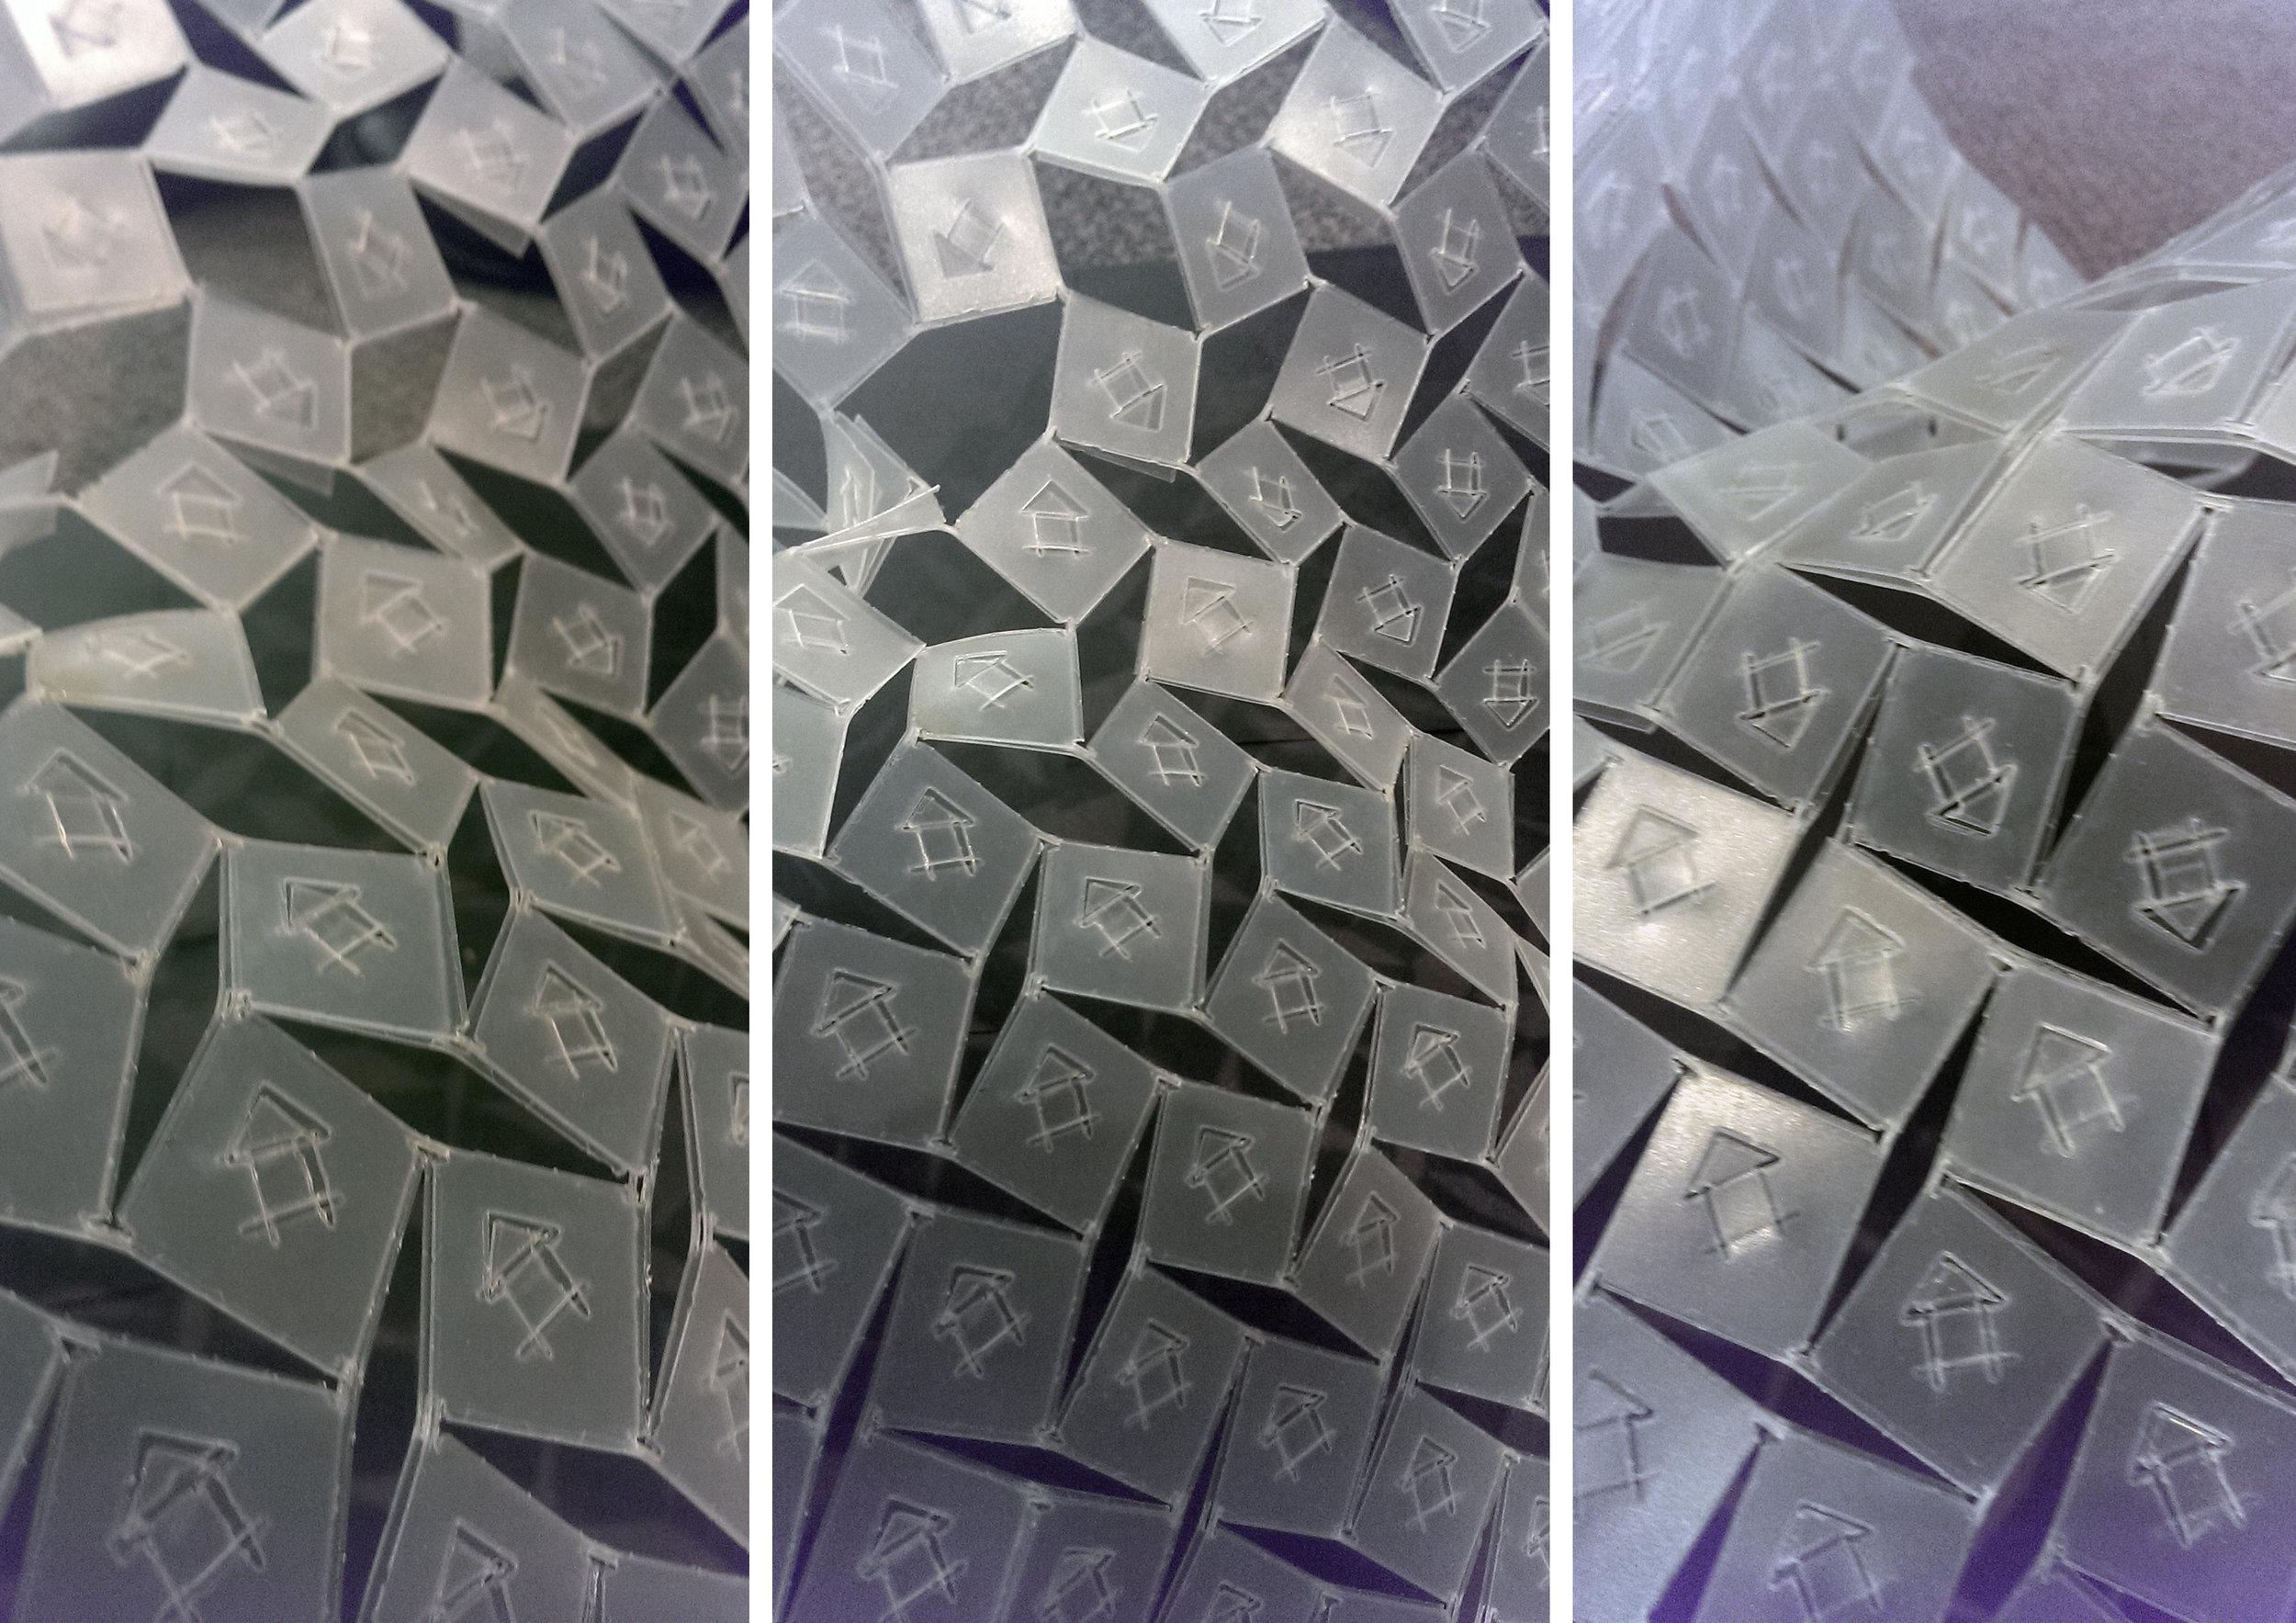 Kintetic Tiling 010.jpg